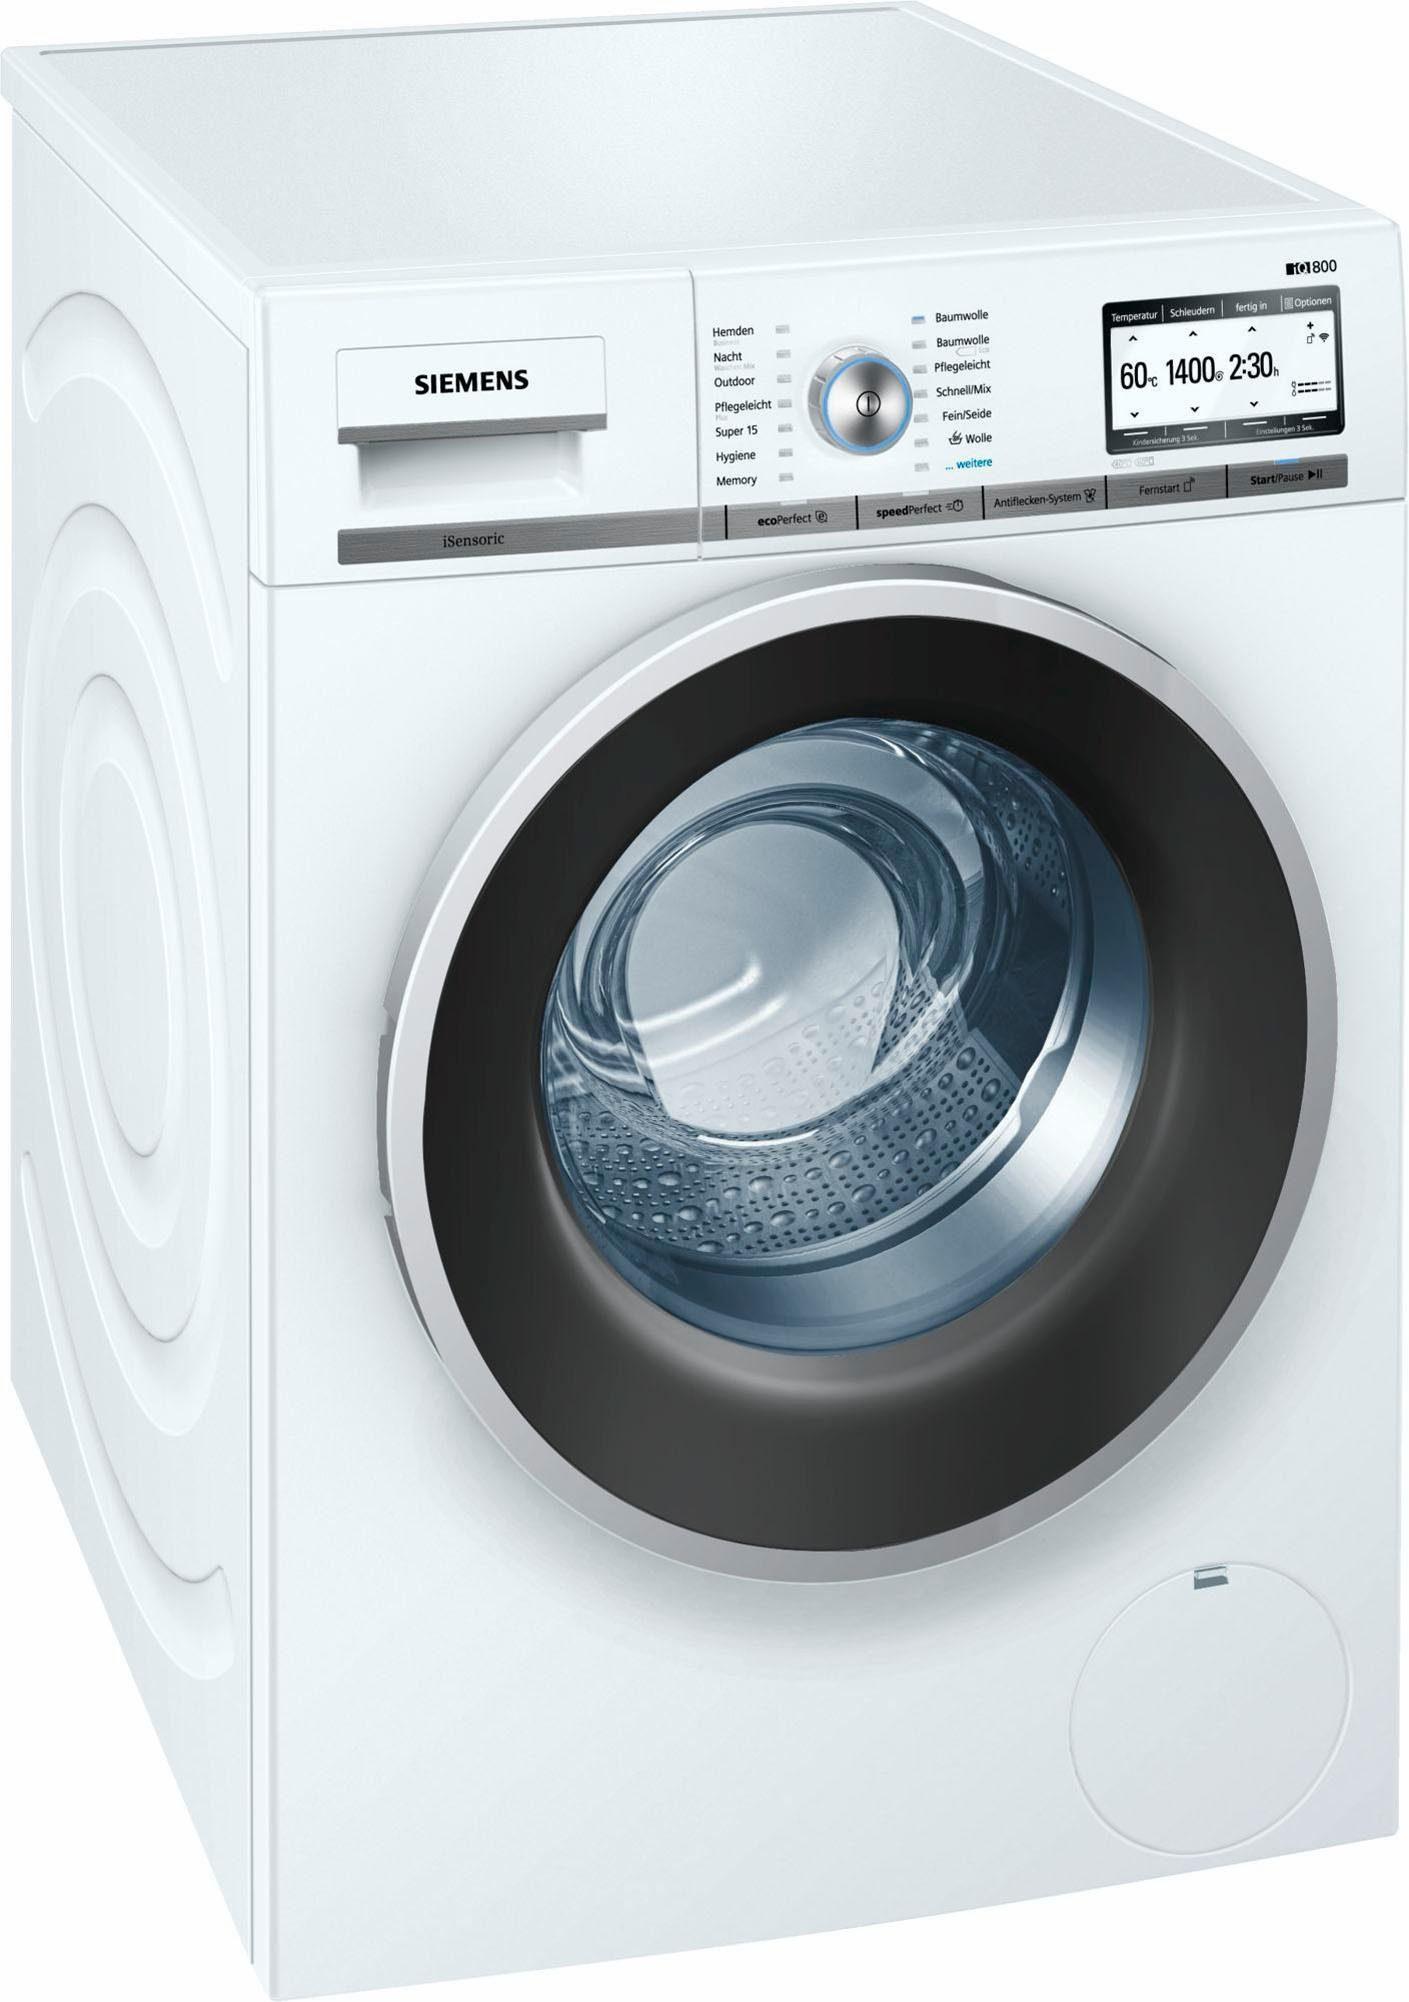 SIEMENS Waschmaschine iQ800 WM4YH7W0, 8 kg, 1400 U/Min